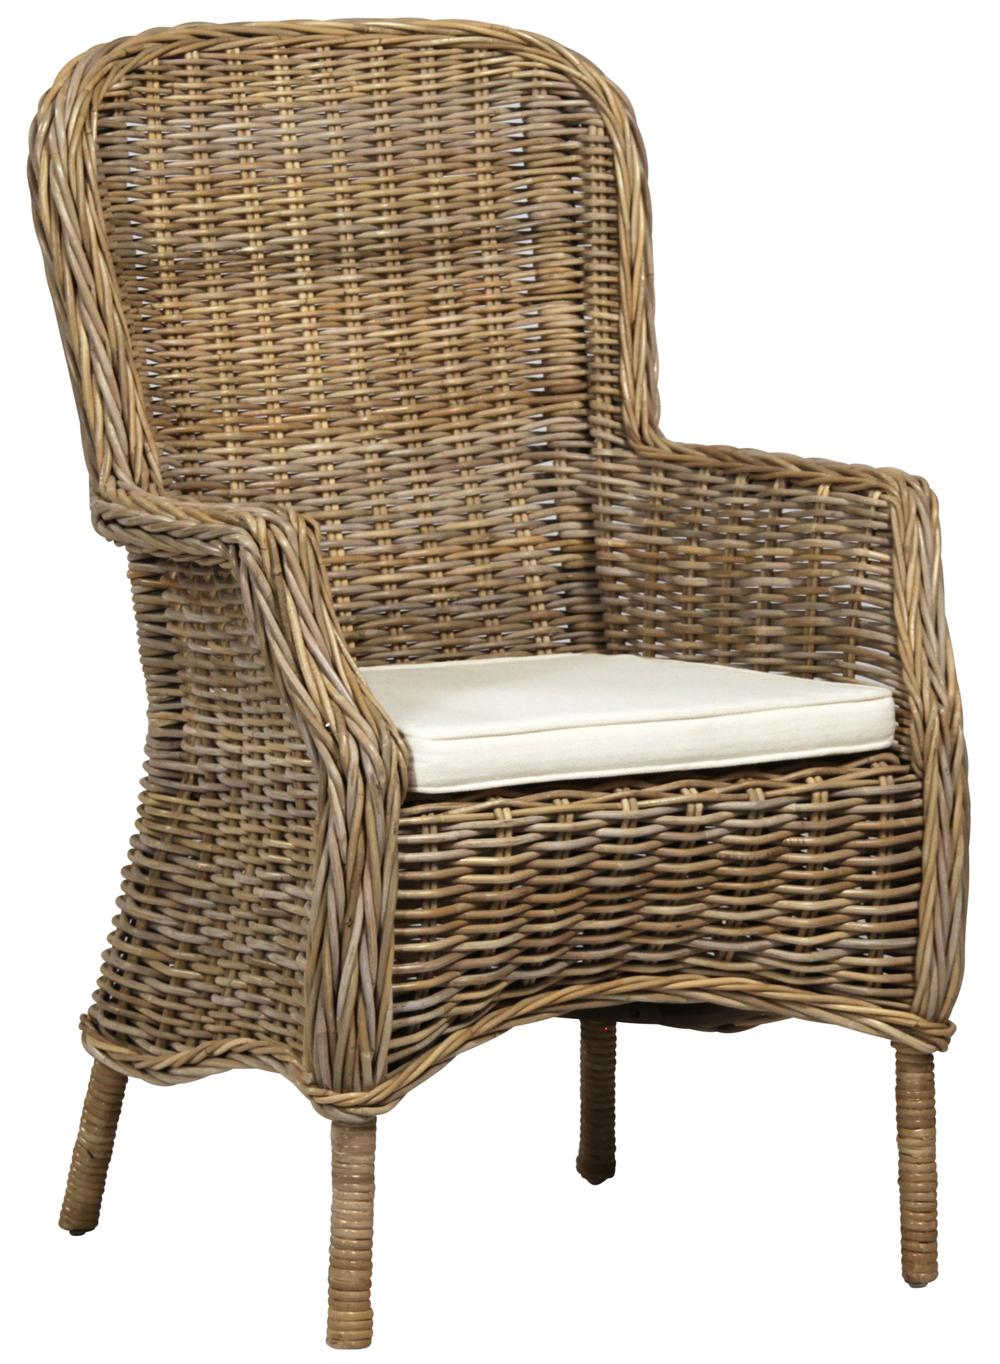 Dovetail Furniture - Knox Arm Chair